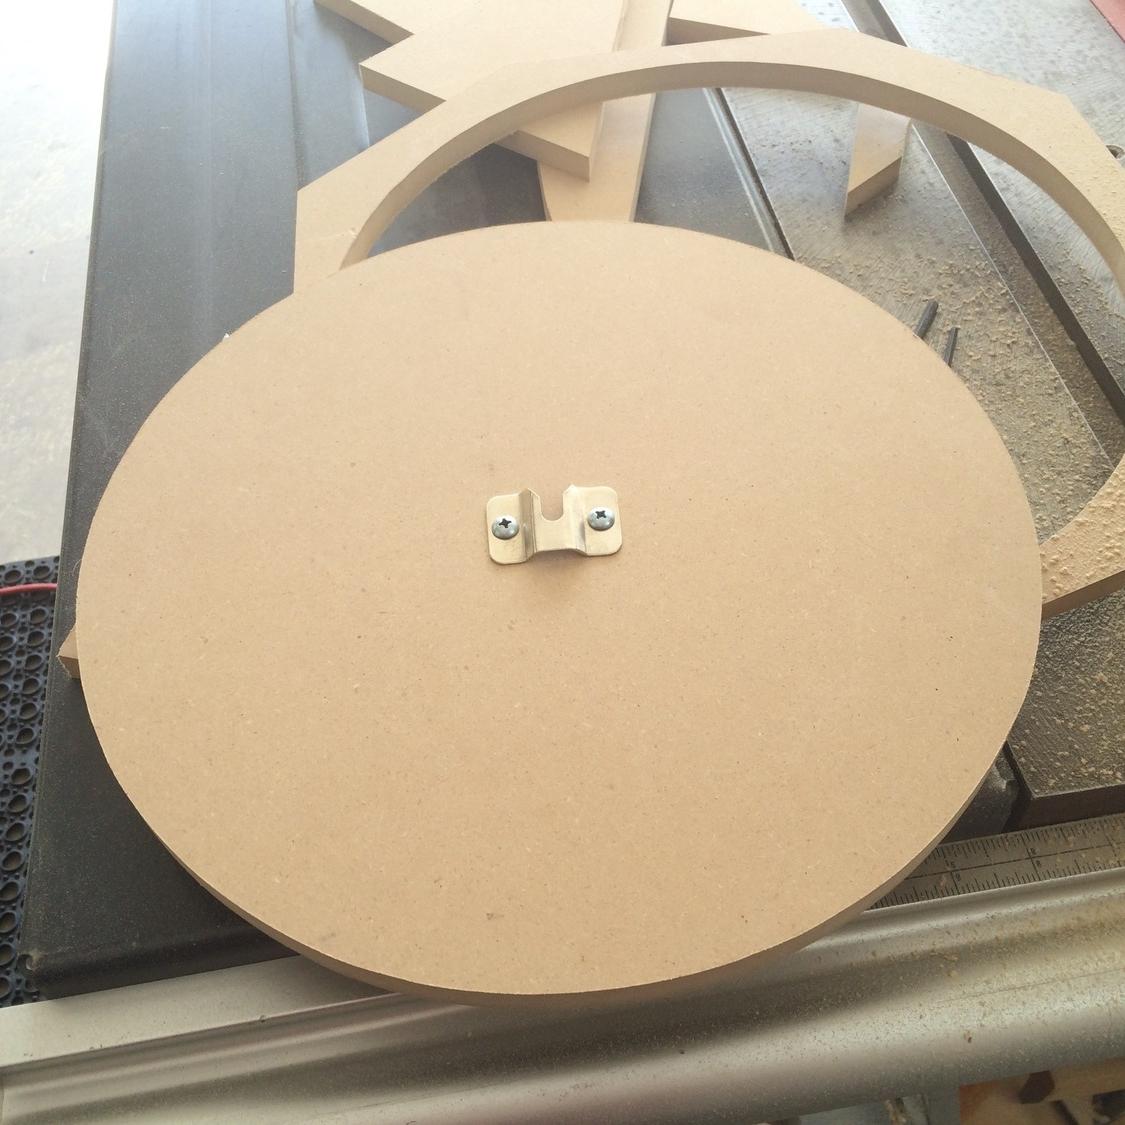 Nice, round dartboard holder to sturdy up dartboard